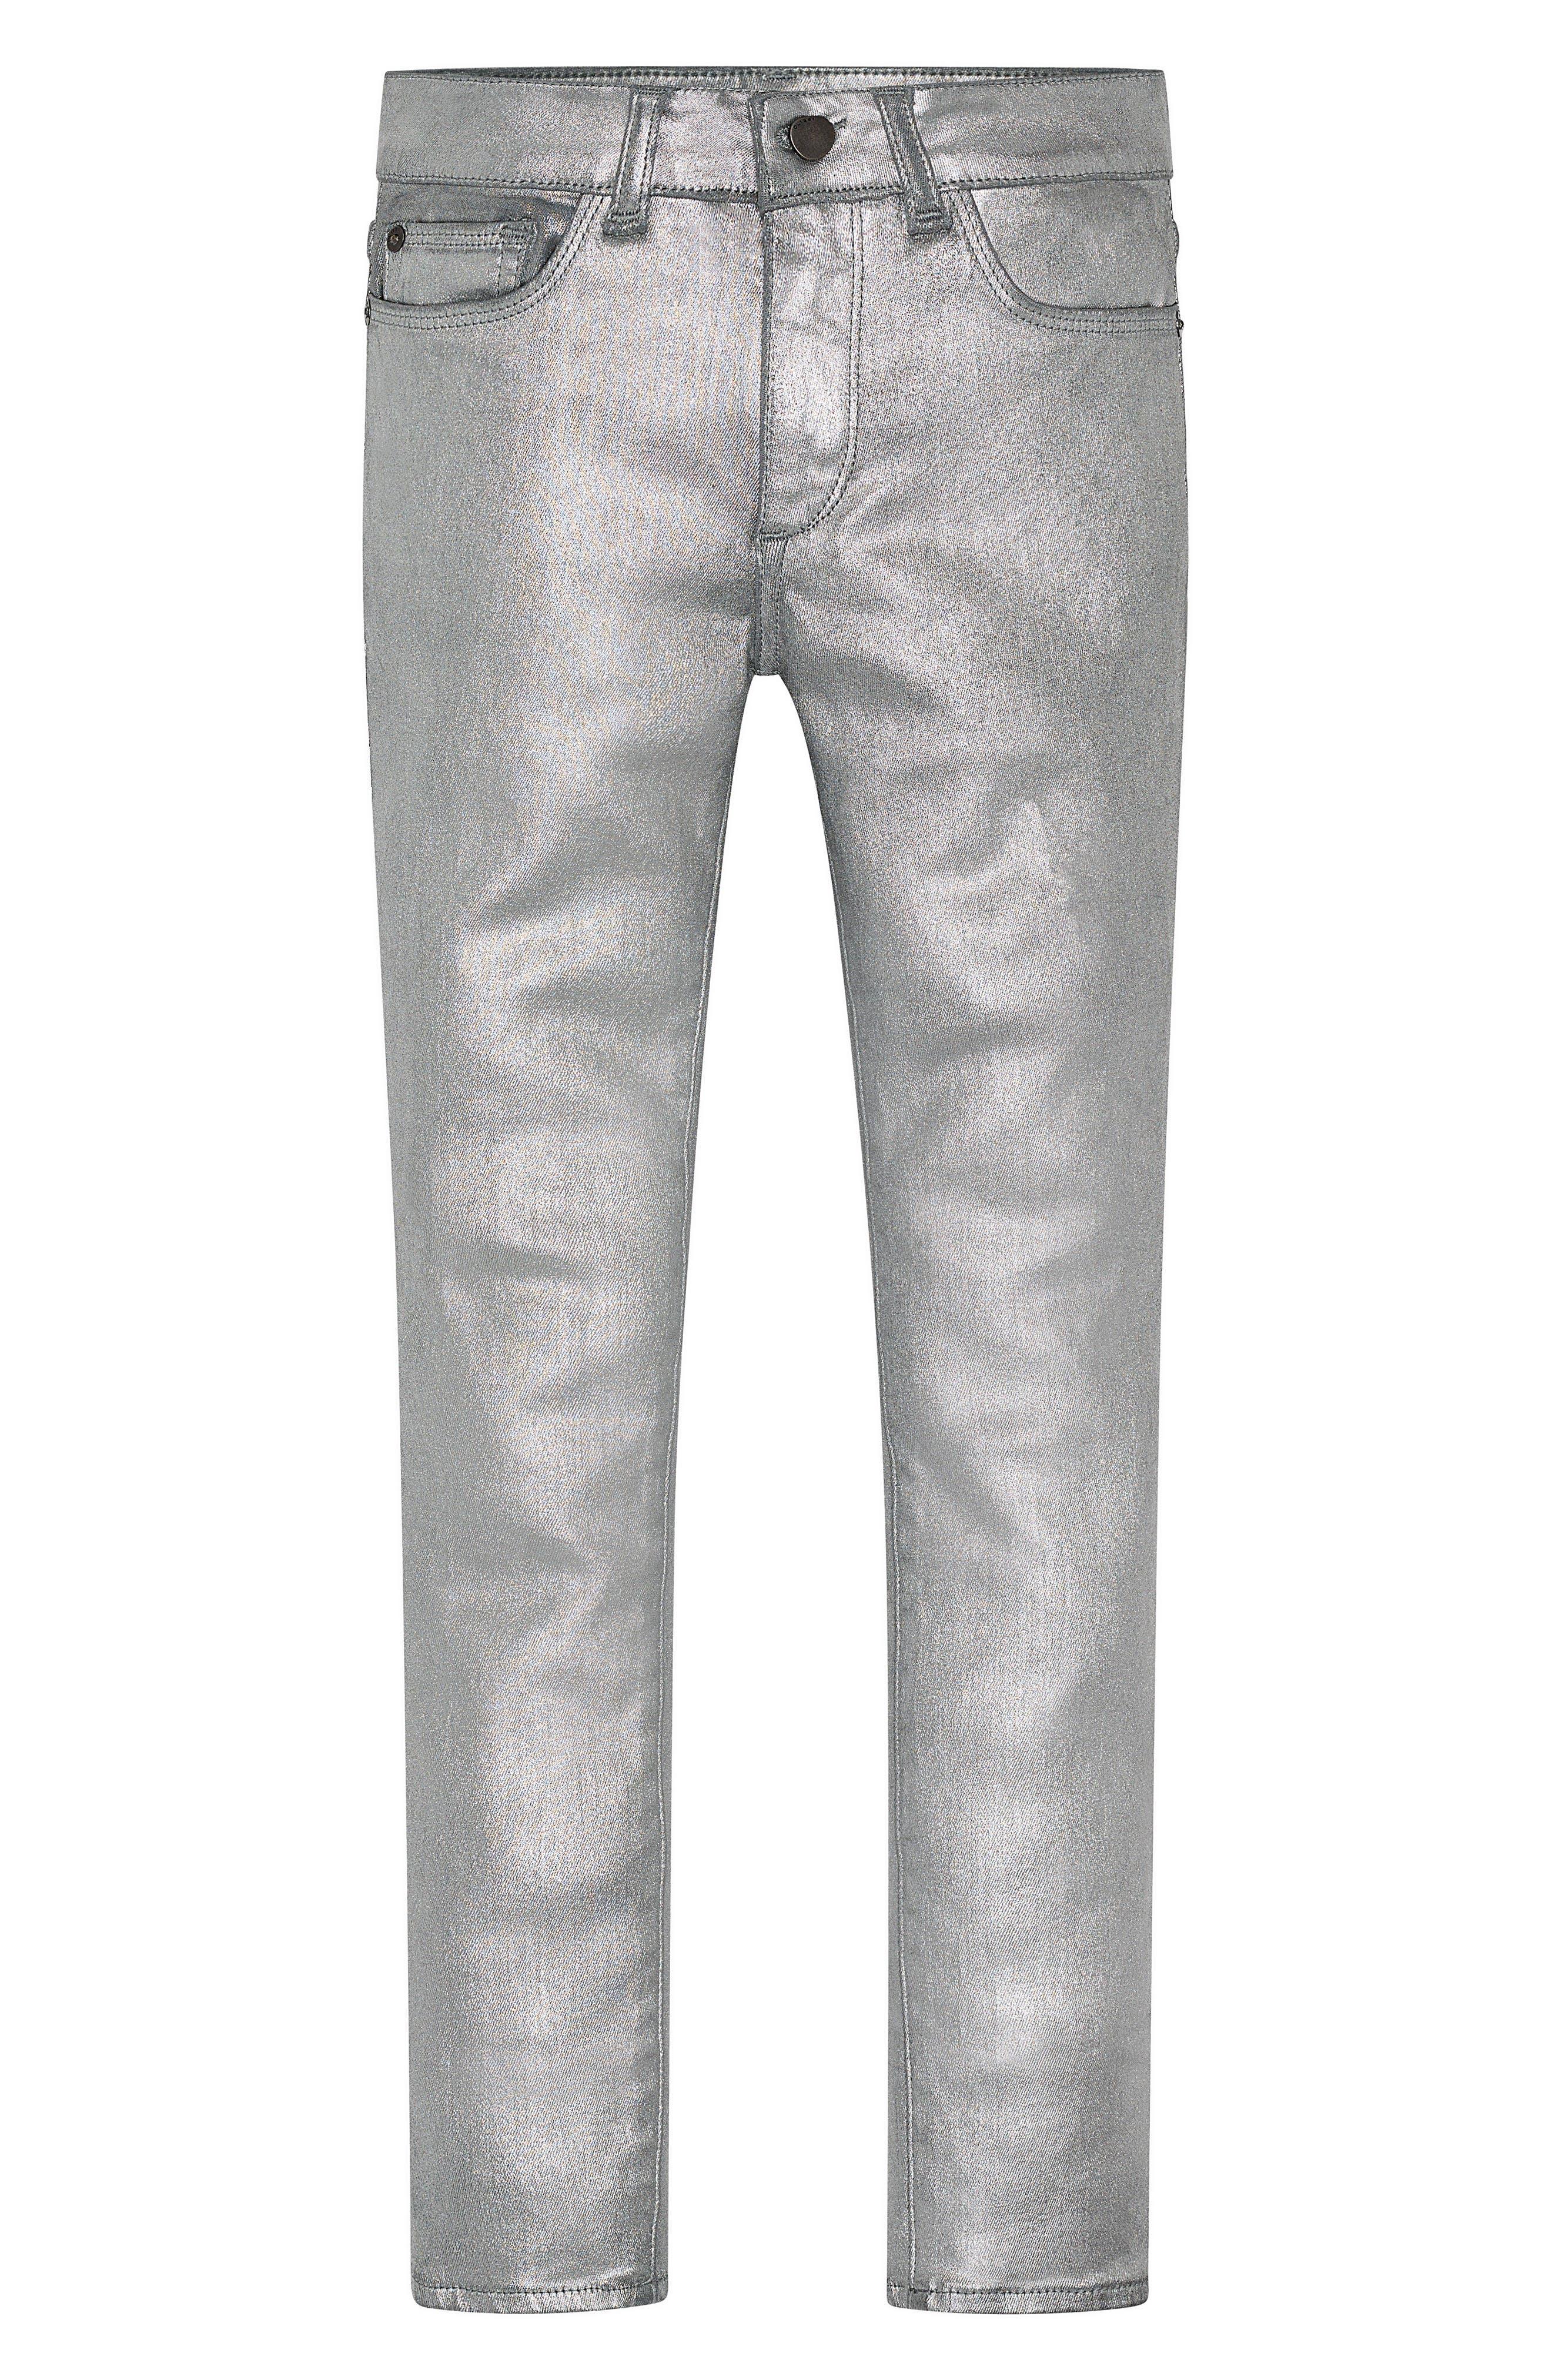 Chloe Coated Skinny Jeans,                         Main,                         color, Silverado